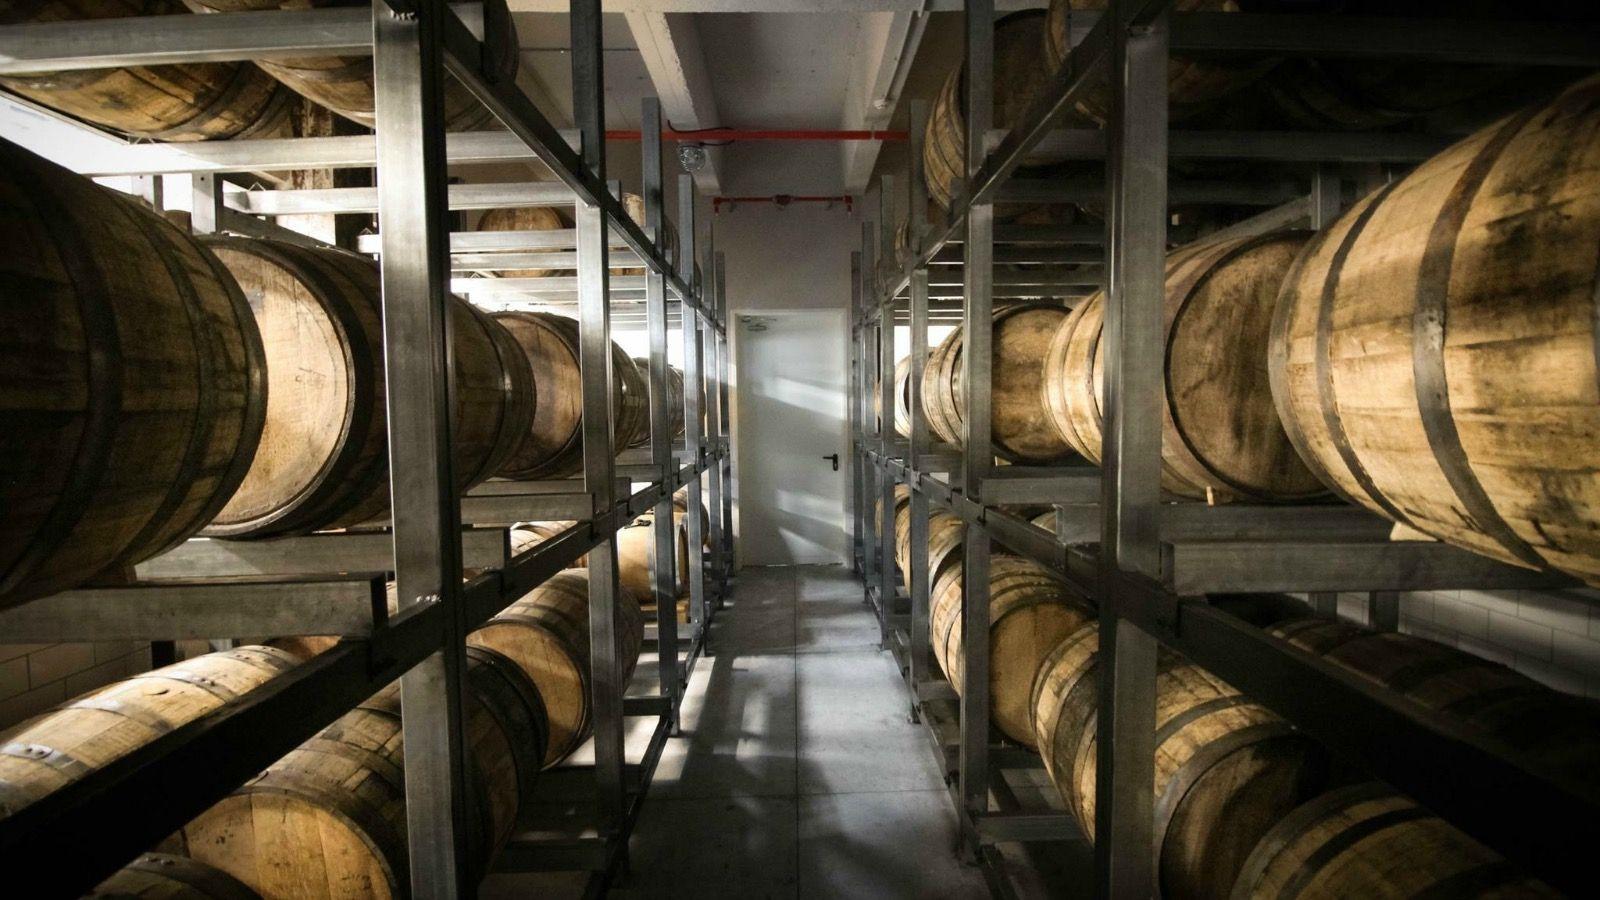 Dozens of barrels of Milk and Honey Whisky.